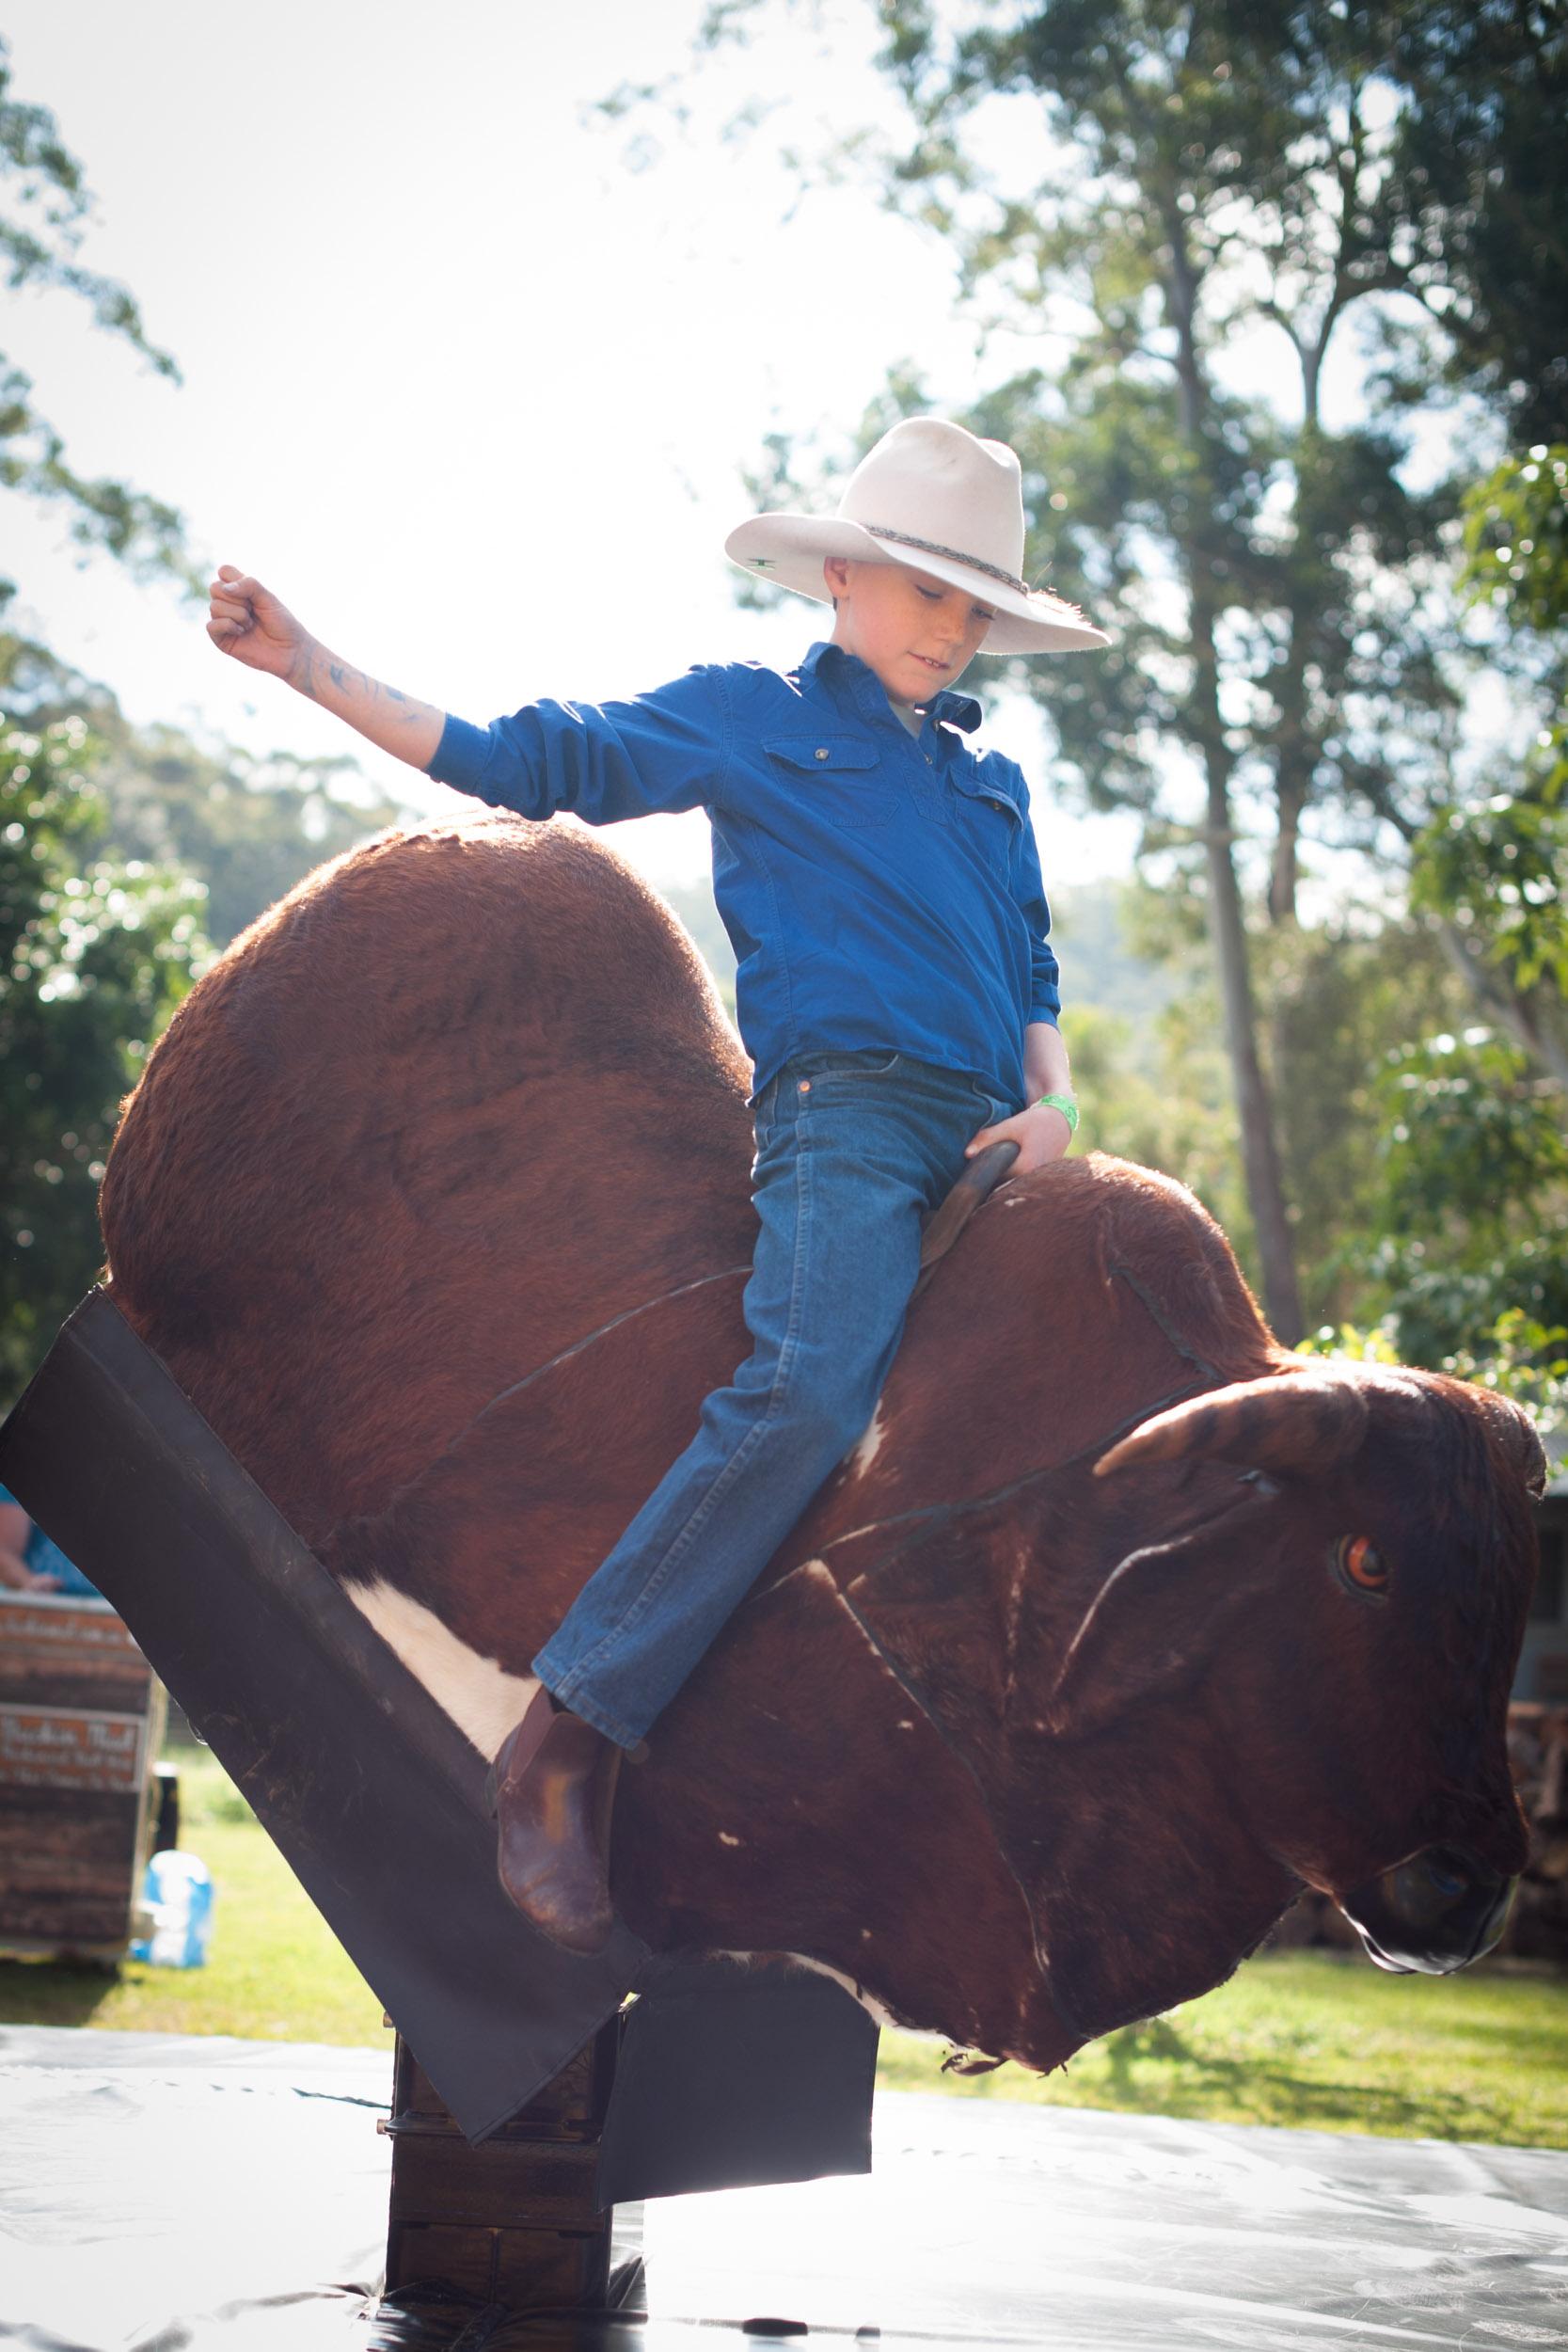 bucking bronco riding